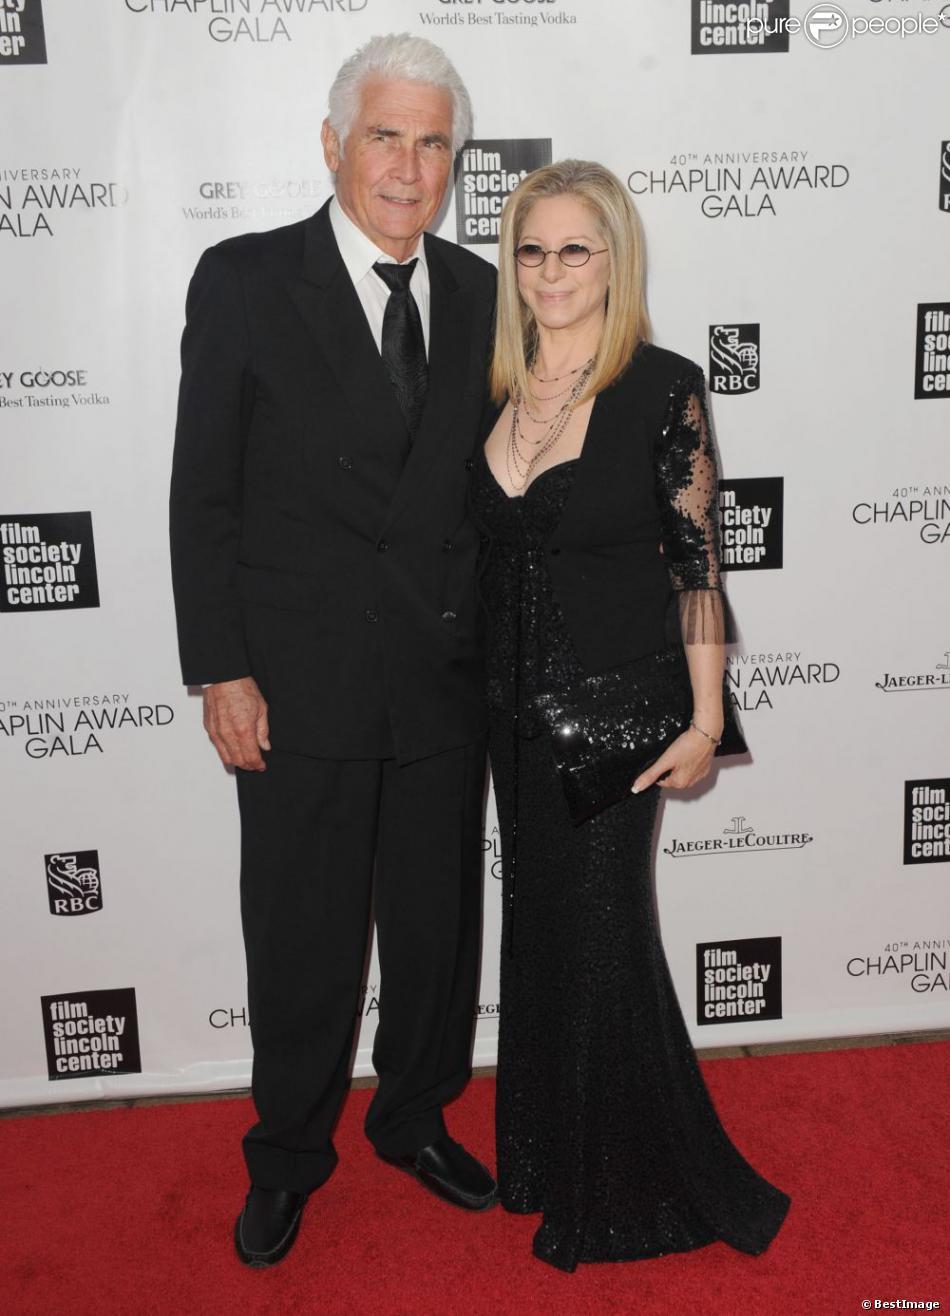 James Brolin et Barbra Streisand lors du gala Chaplin Awards à New York le 22 avril 2013